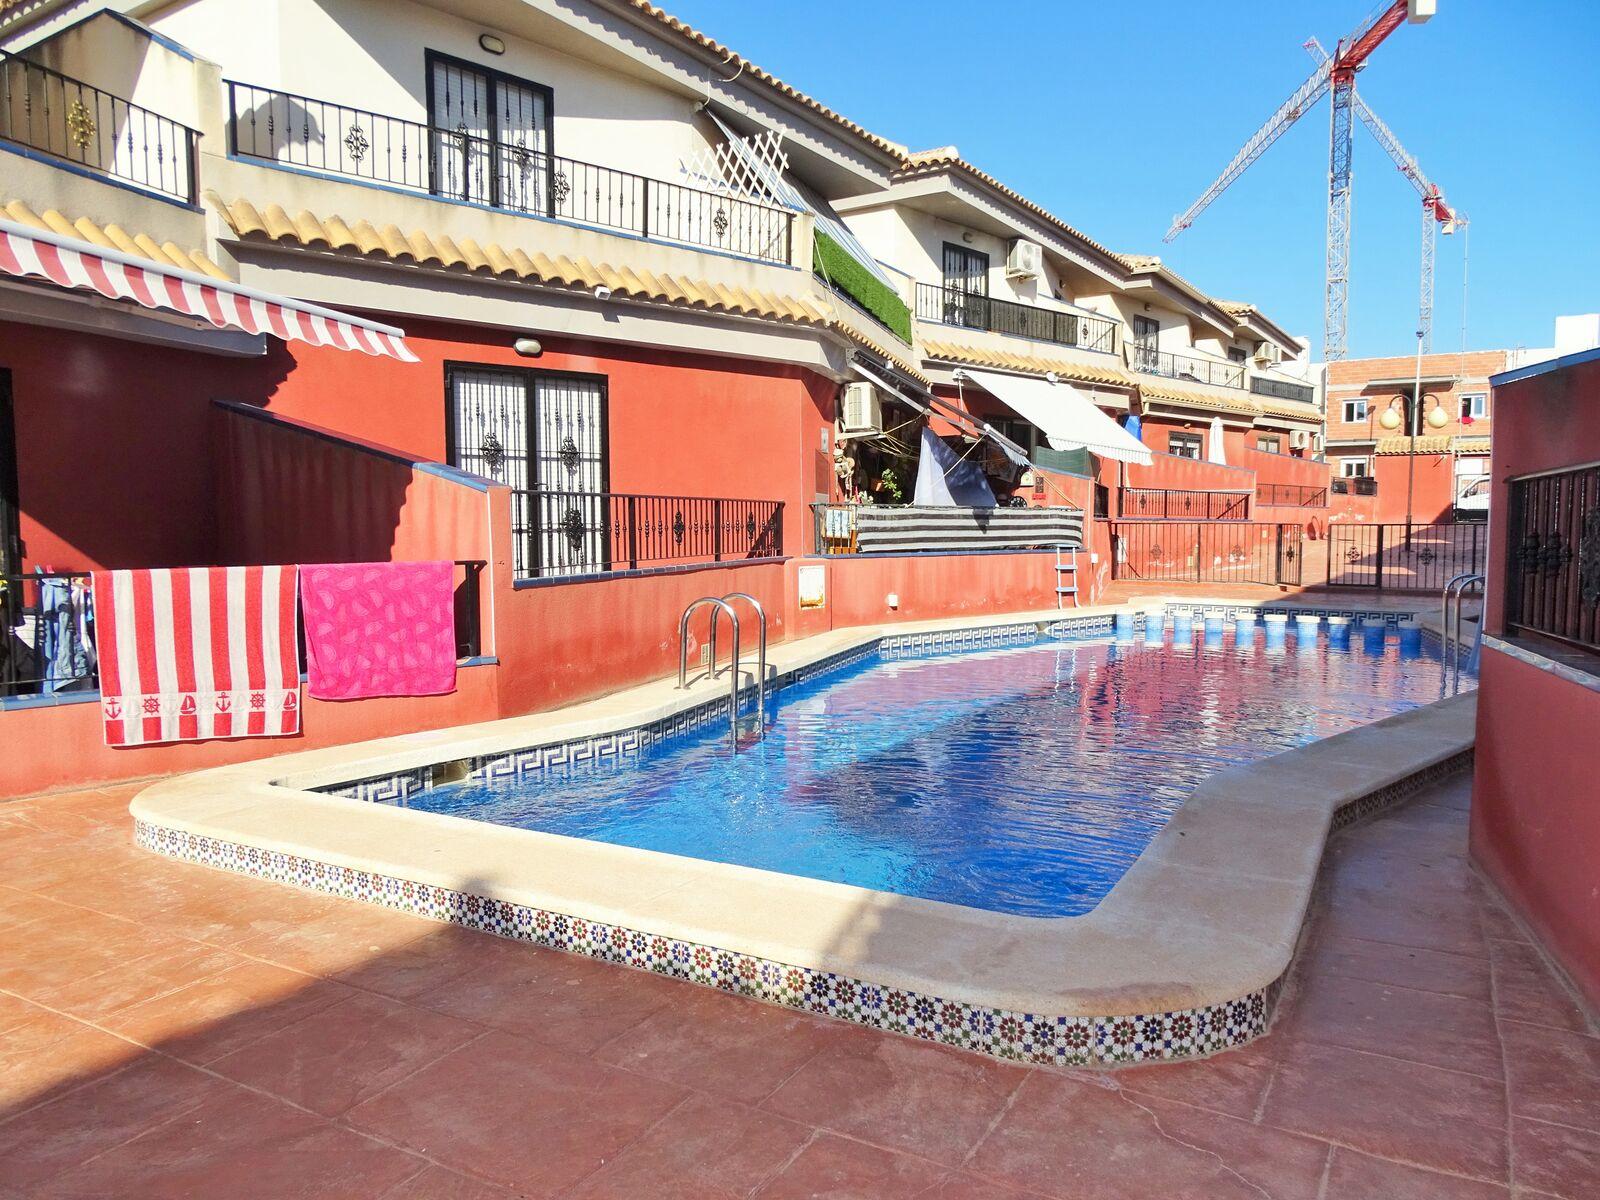 SPAIN COSTA BLANCA – TORREVIEJA, WONDERFUL TOWNHOUSE IN THE URBANISATION AGUAS NUEVAS